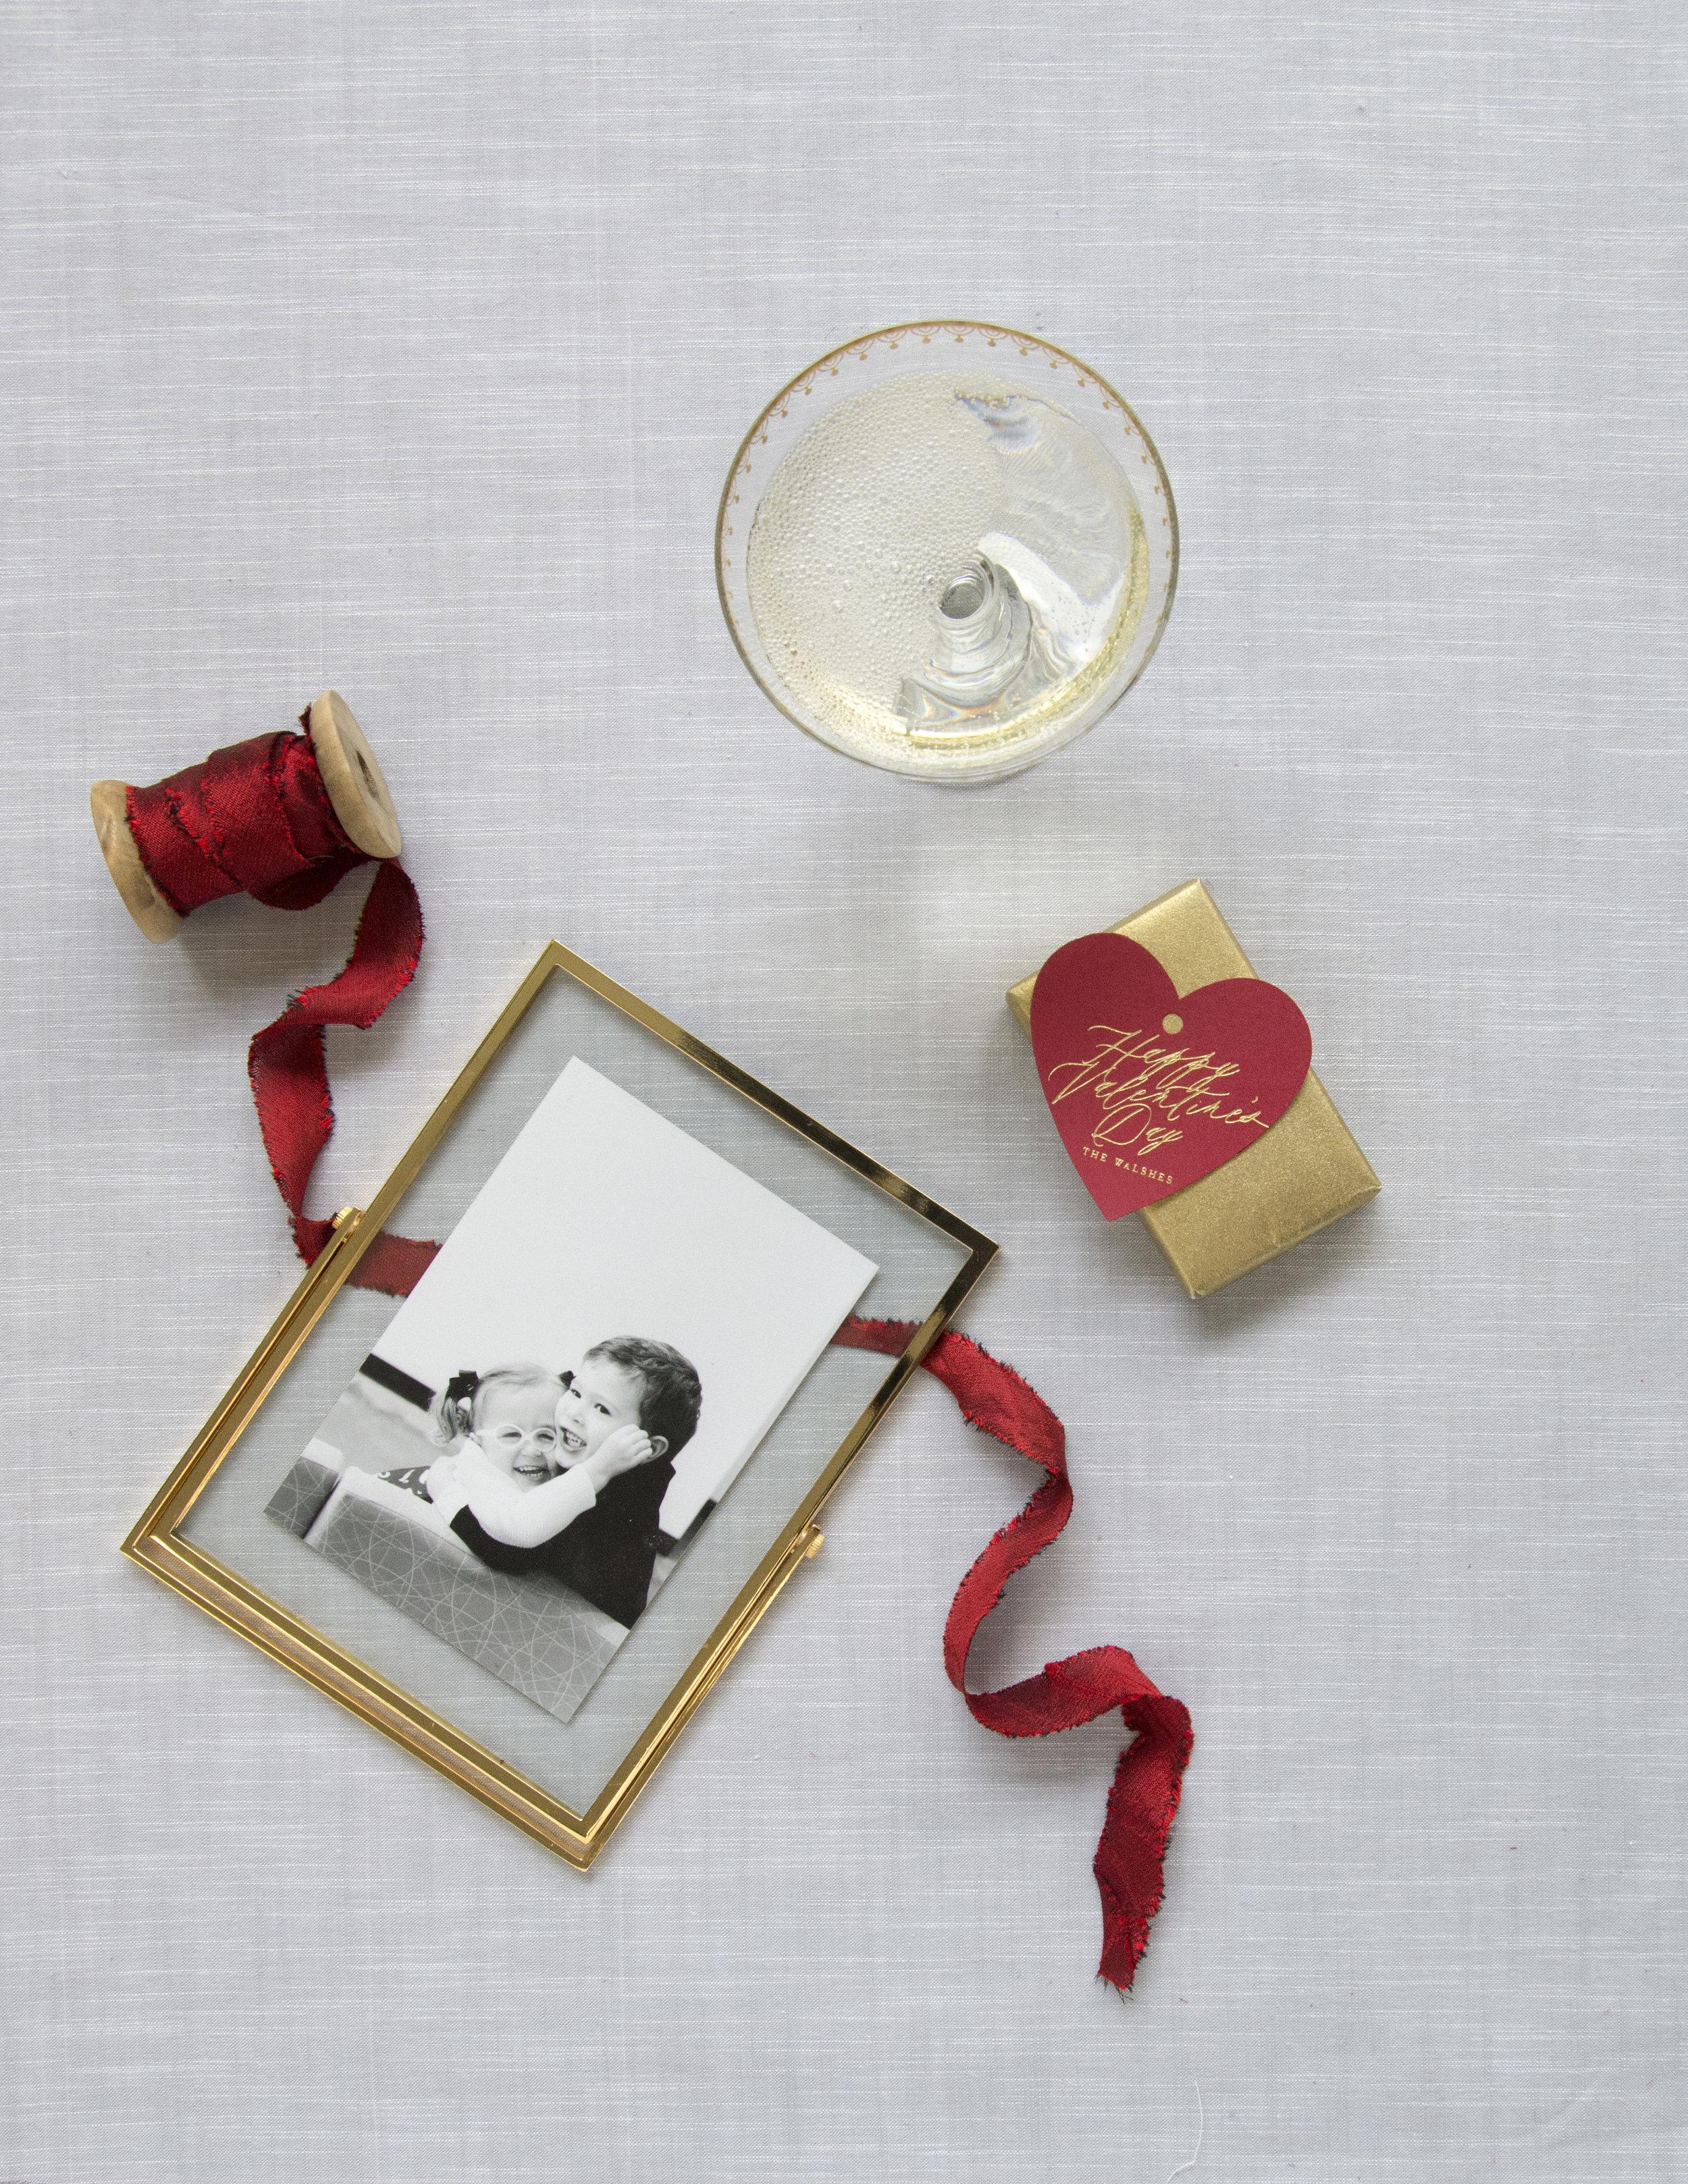 PGT_T307_Stylized_Valentine_Frame_Ribbon_HautePapier.JPG